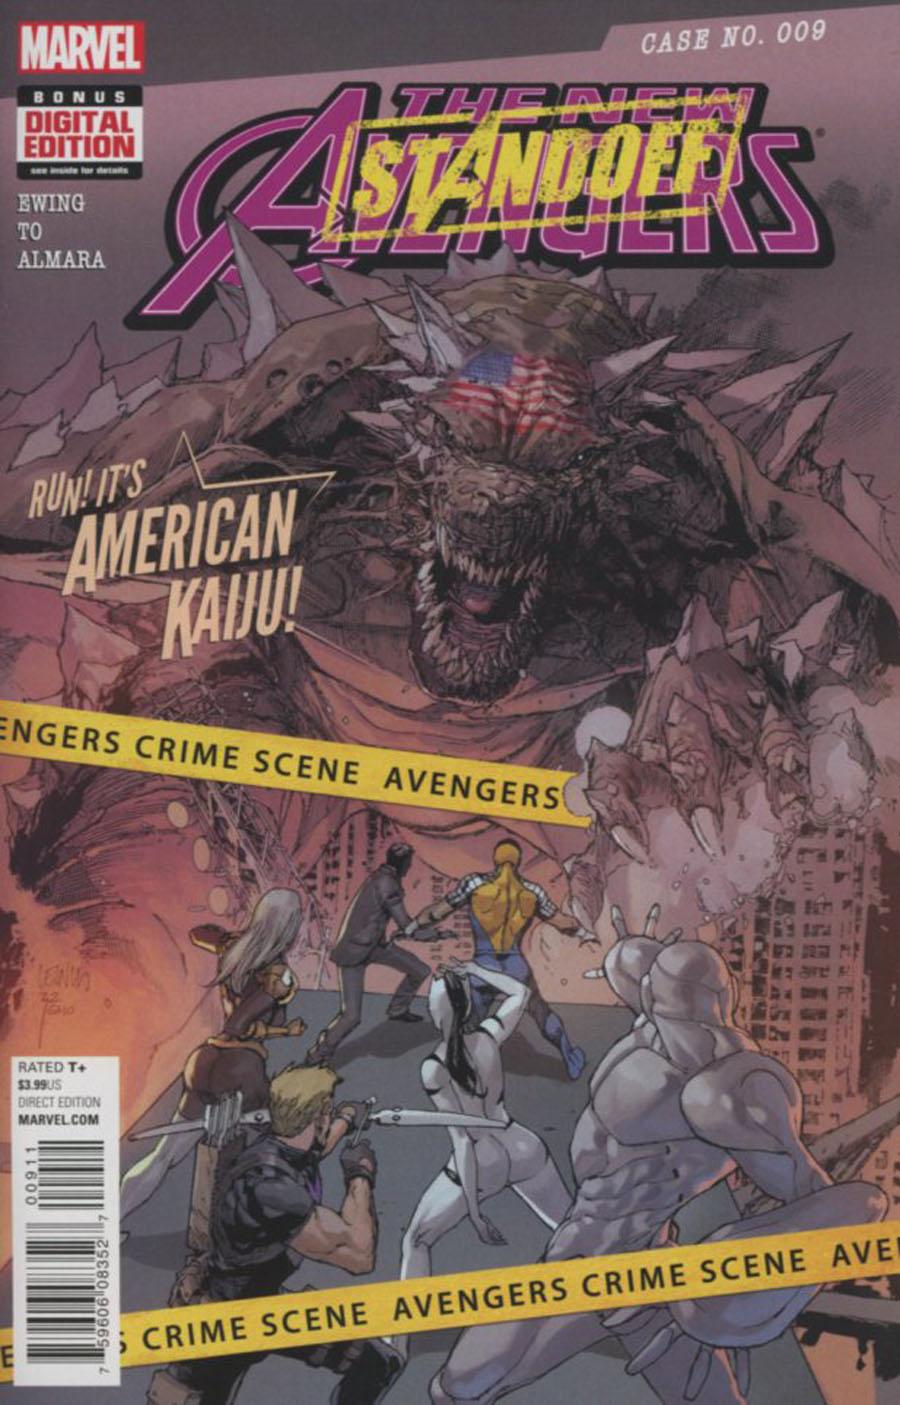 New Avengers Vol 4 #9 (Standoff Tie-In)